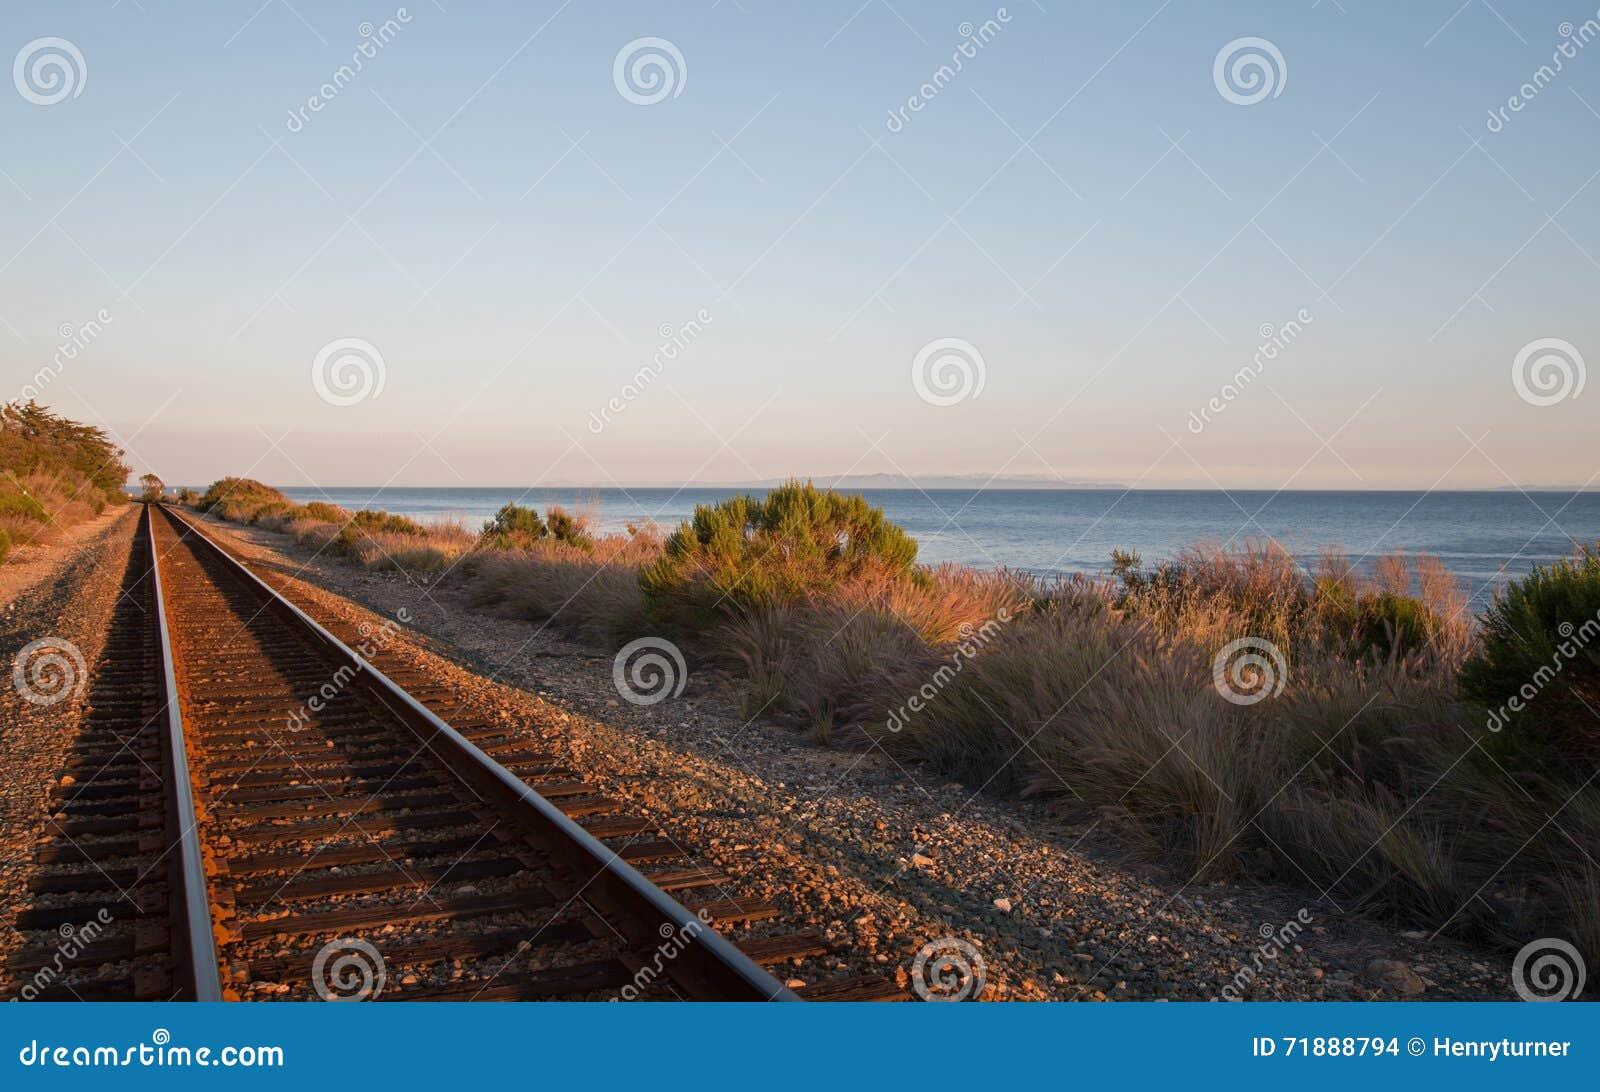 Spoorwegsporen op de Centrale Kust van Californië in Goleta/Santa Barbara bij zonsondergang